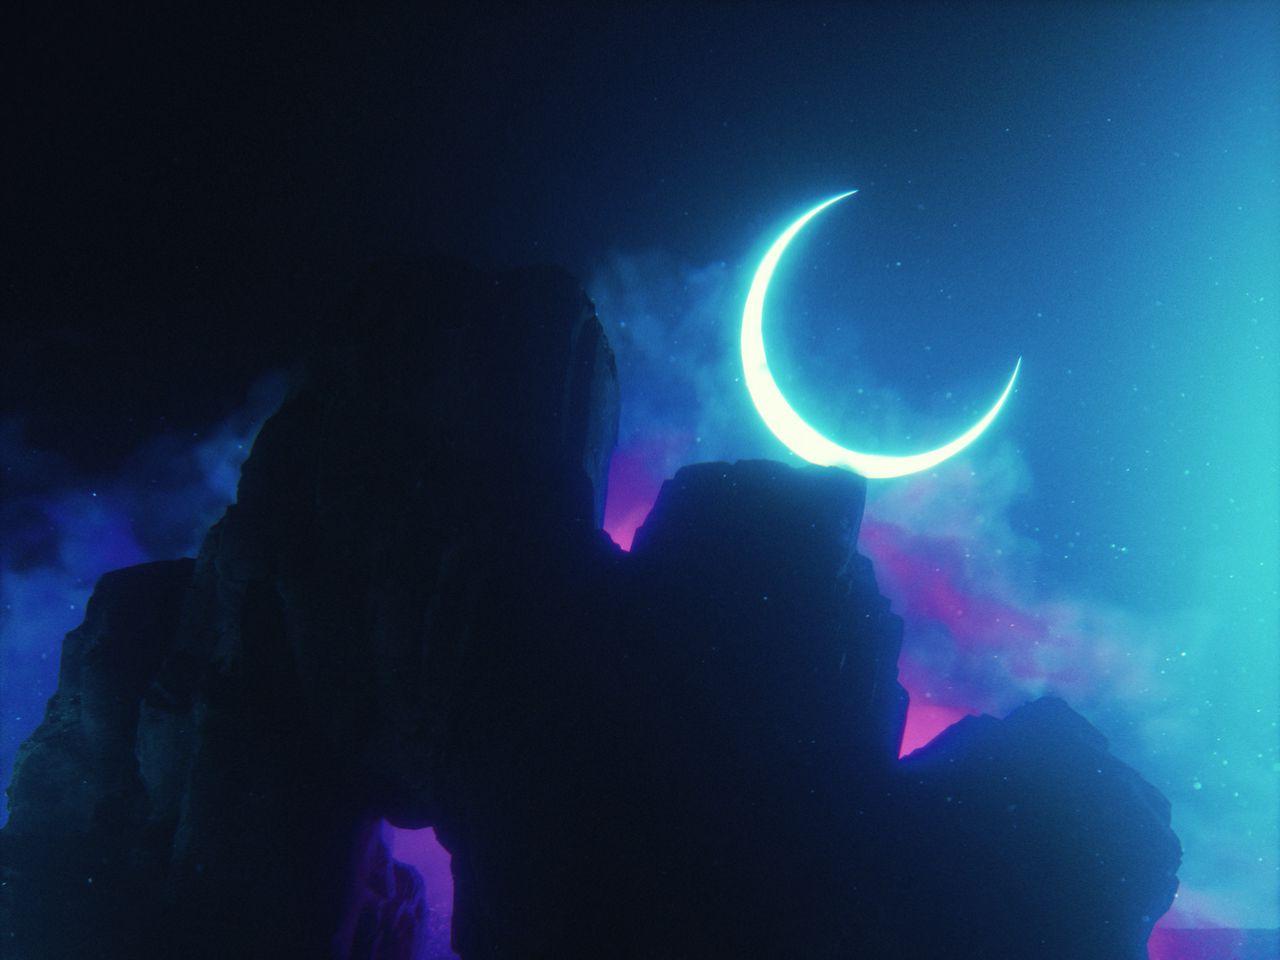 1280x960 Wallpaper rock, neon, smoke, moon, light, bright